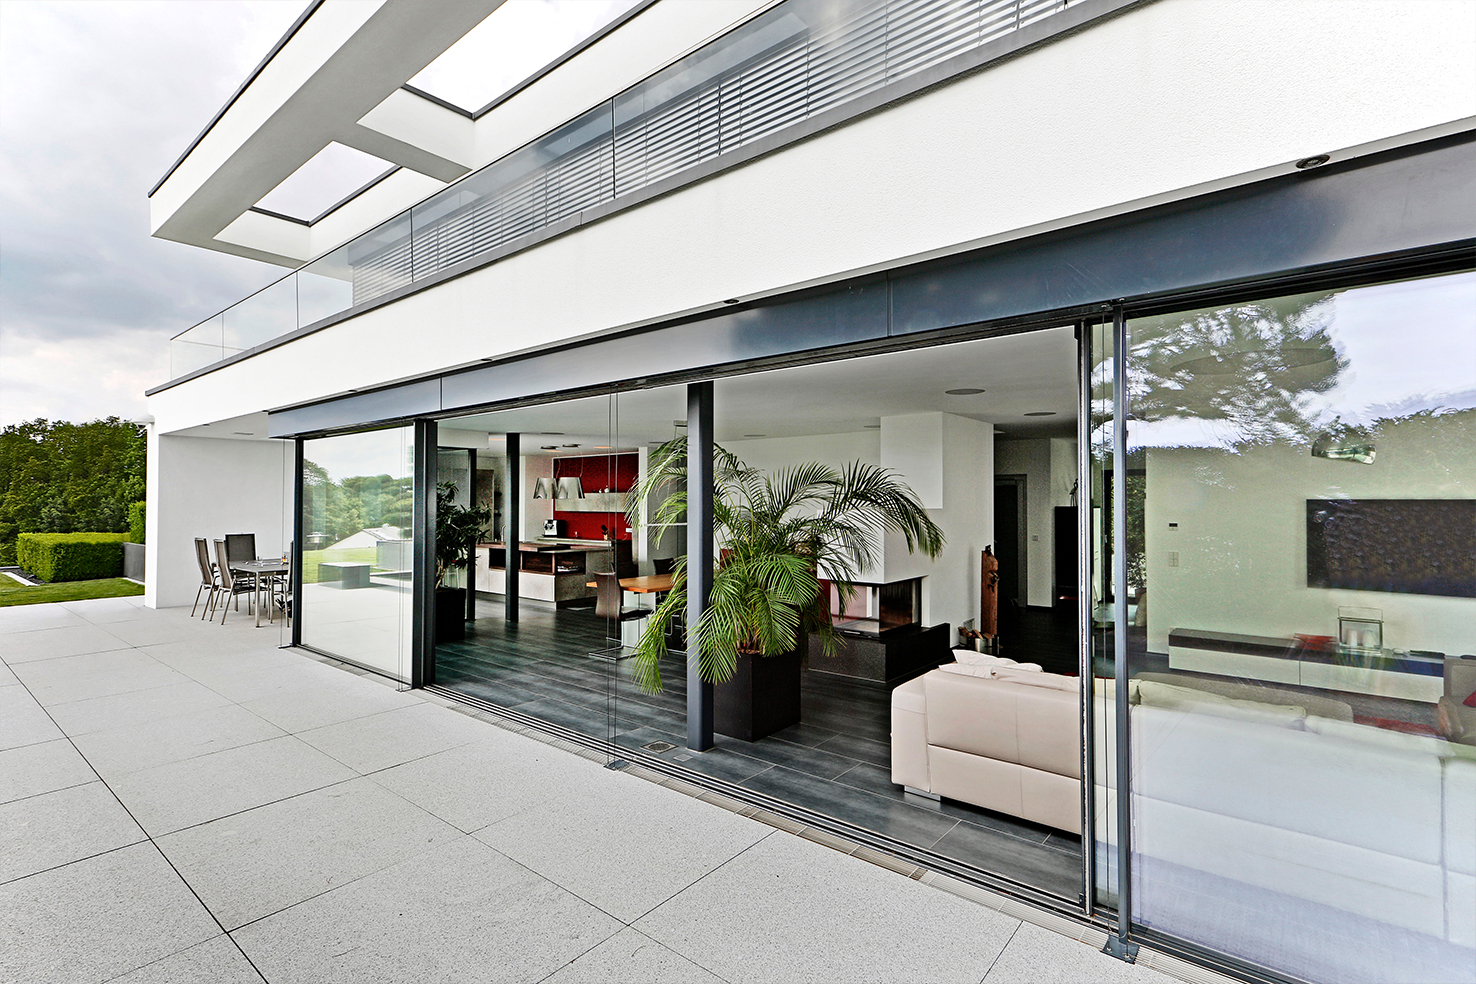 Exklusive haeuser kapitel2 aussen 32 1476x984 for Architektenhauser inneneinrichtung